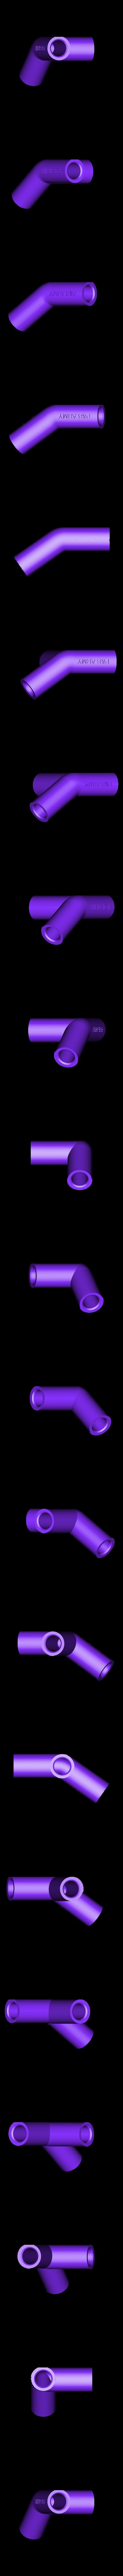 P&B_18.stl Download free STL file P & B ARMY (PIPE AND BOARD) • 3D printable model, DJER